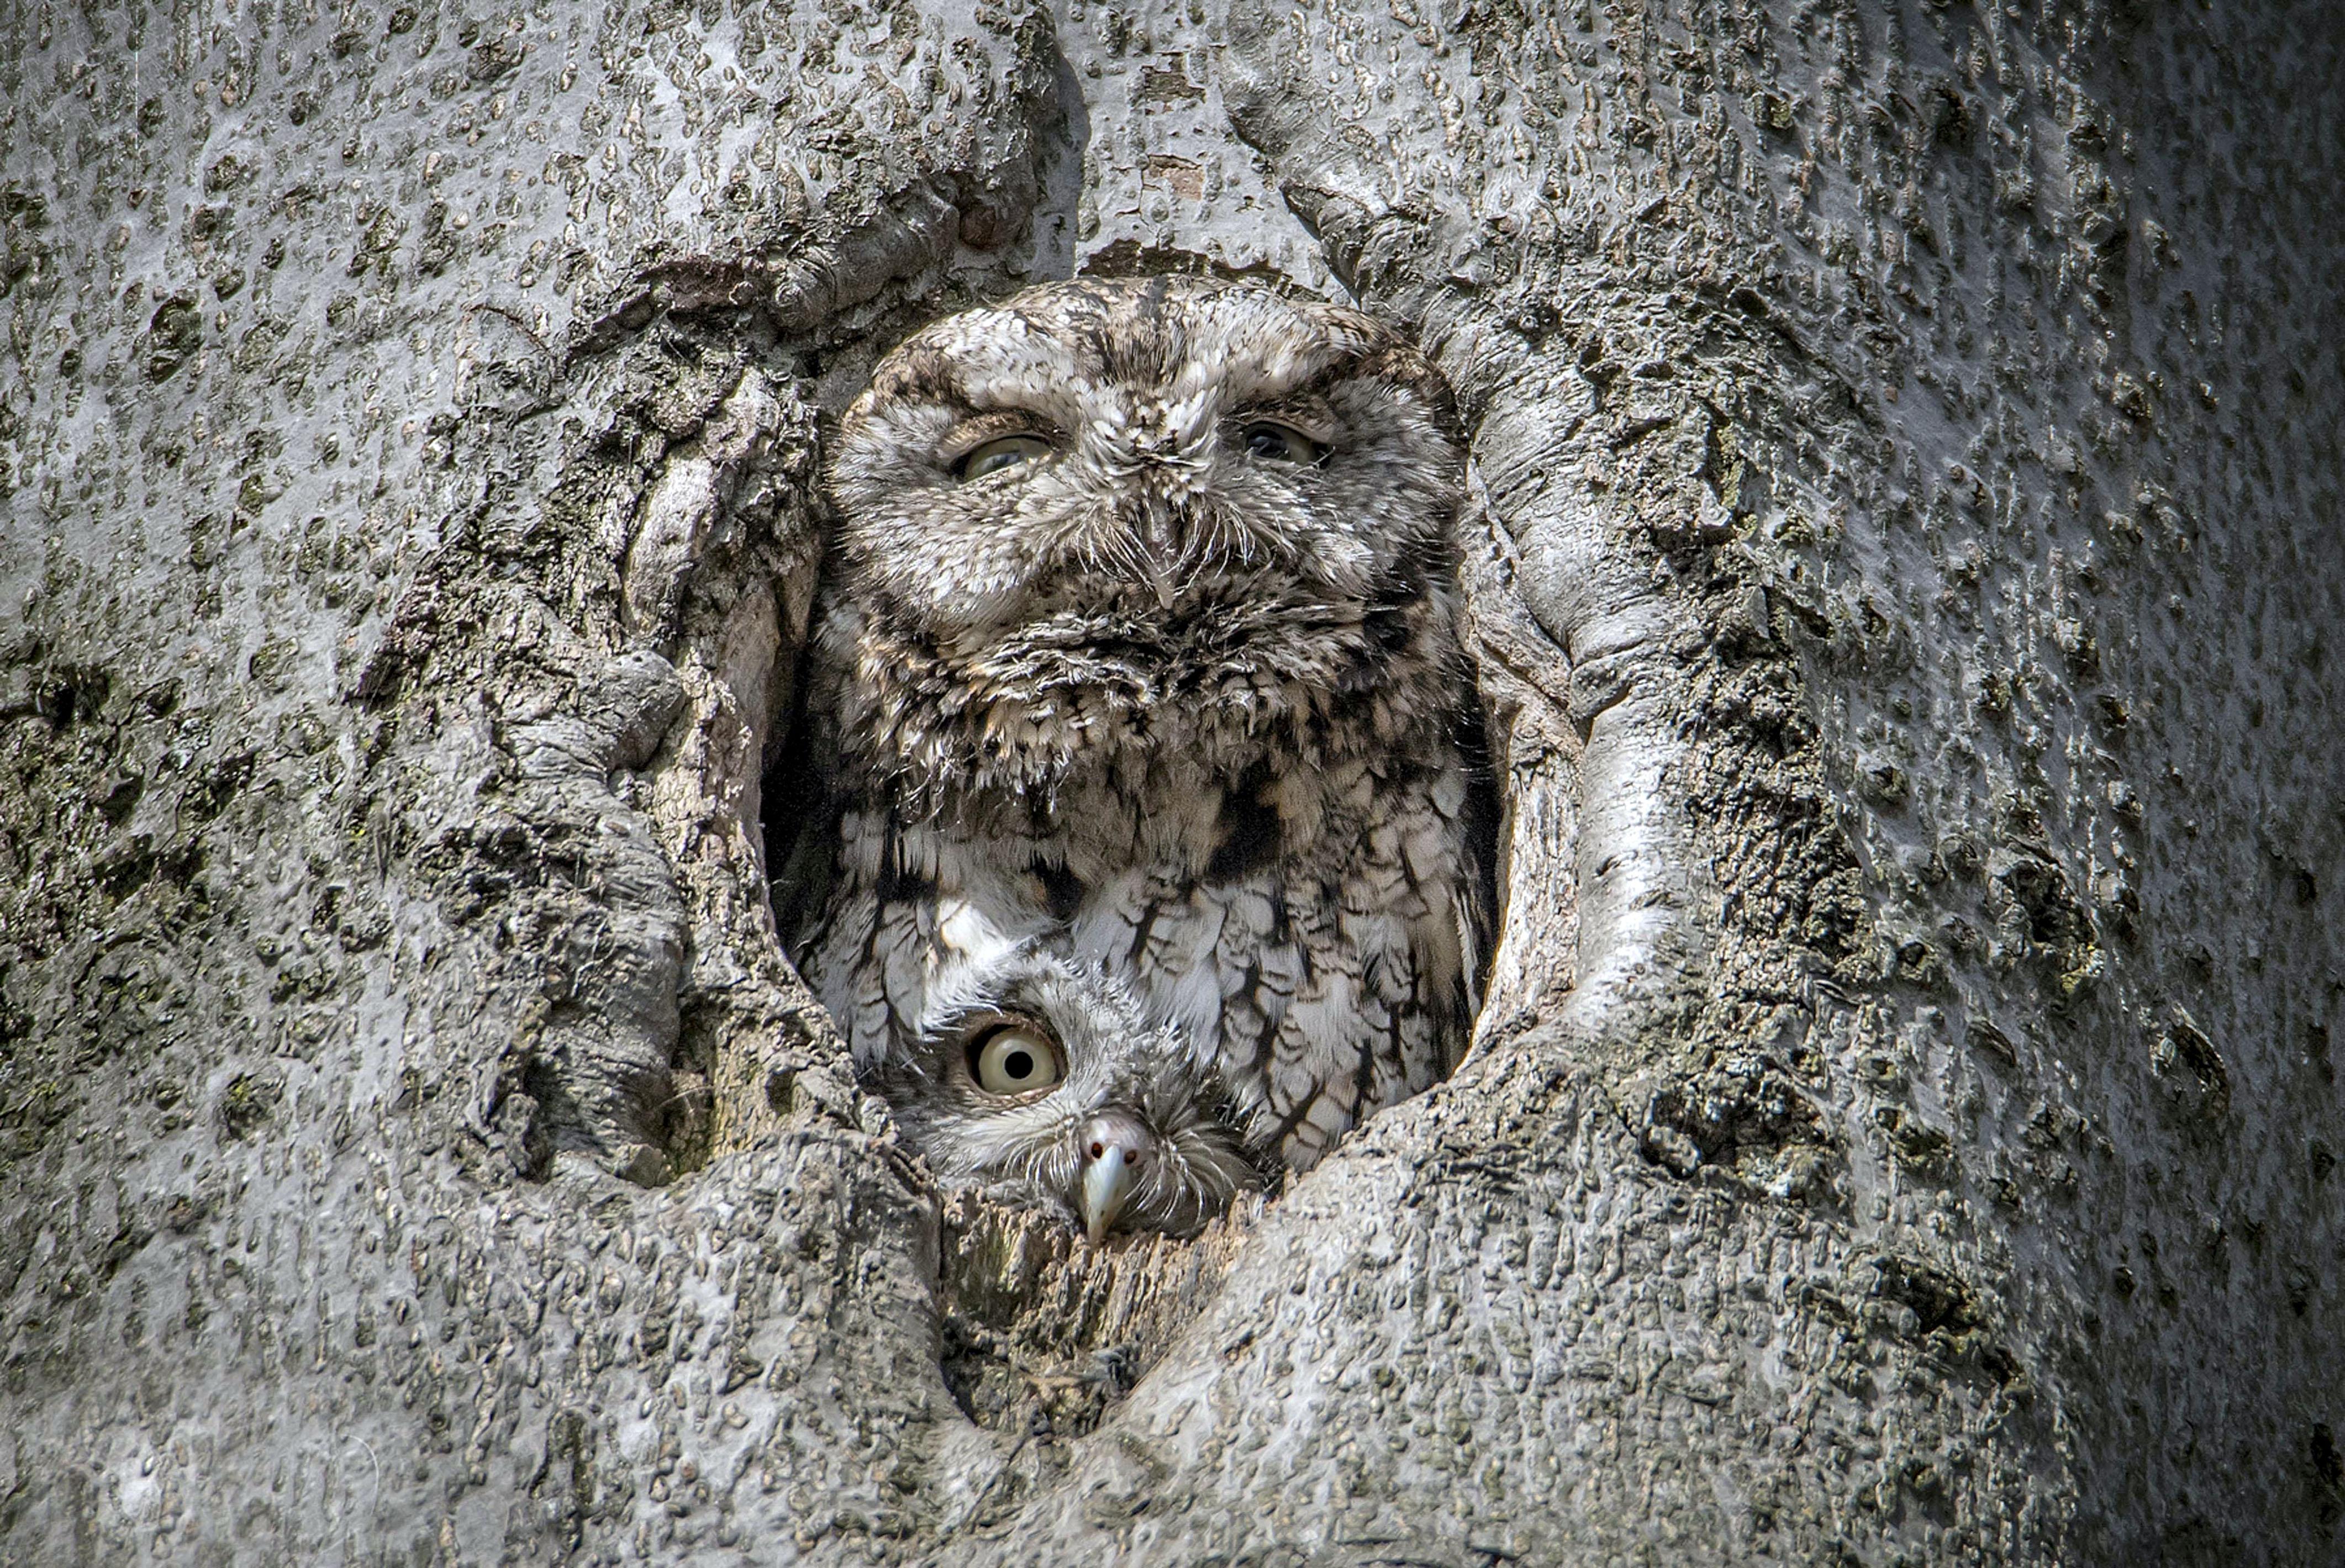 DOUBLE NEST CAMO OWLS